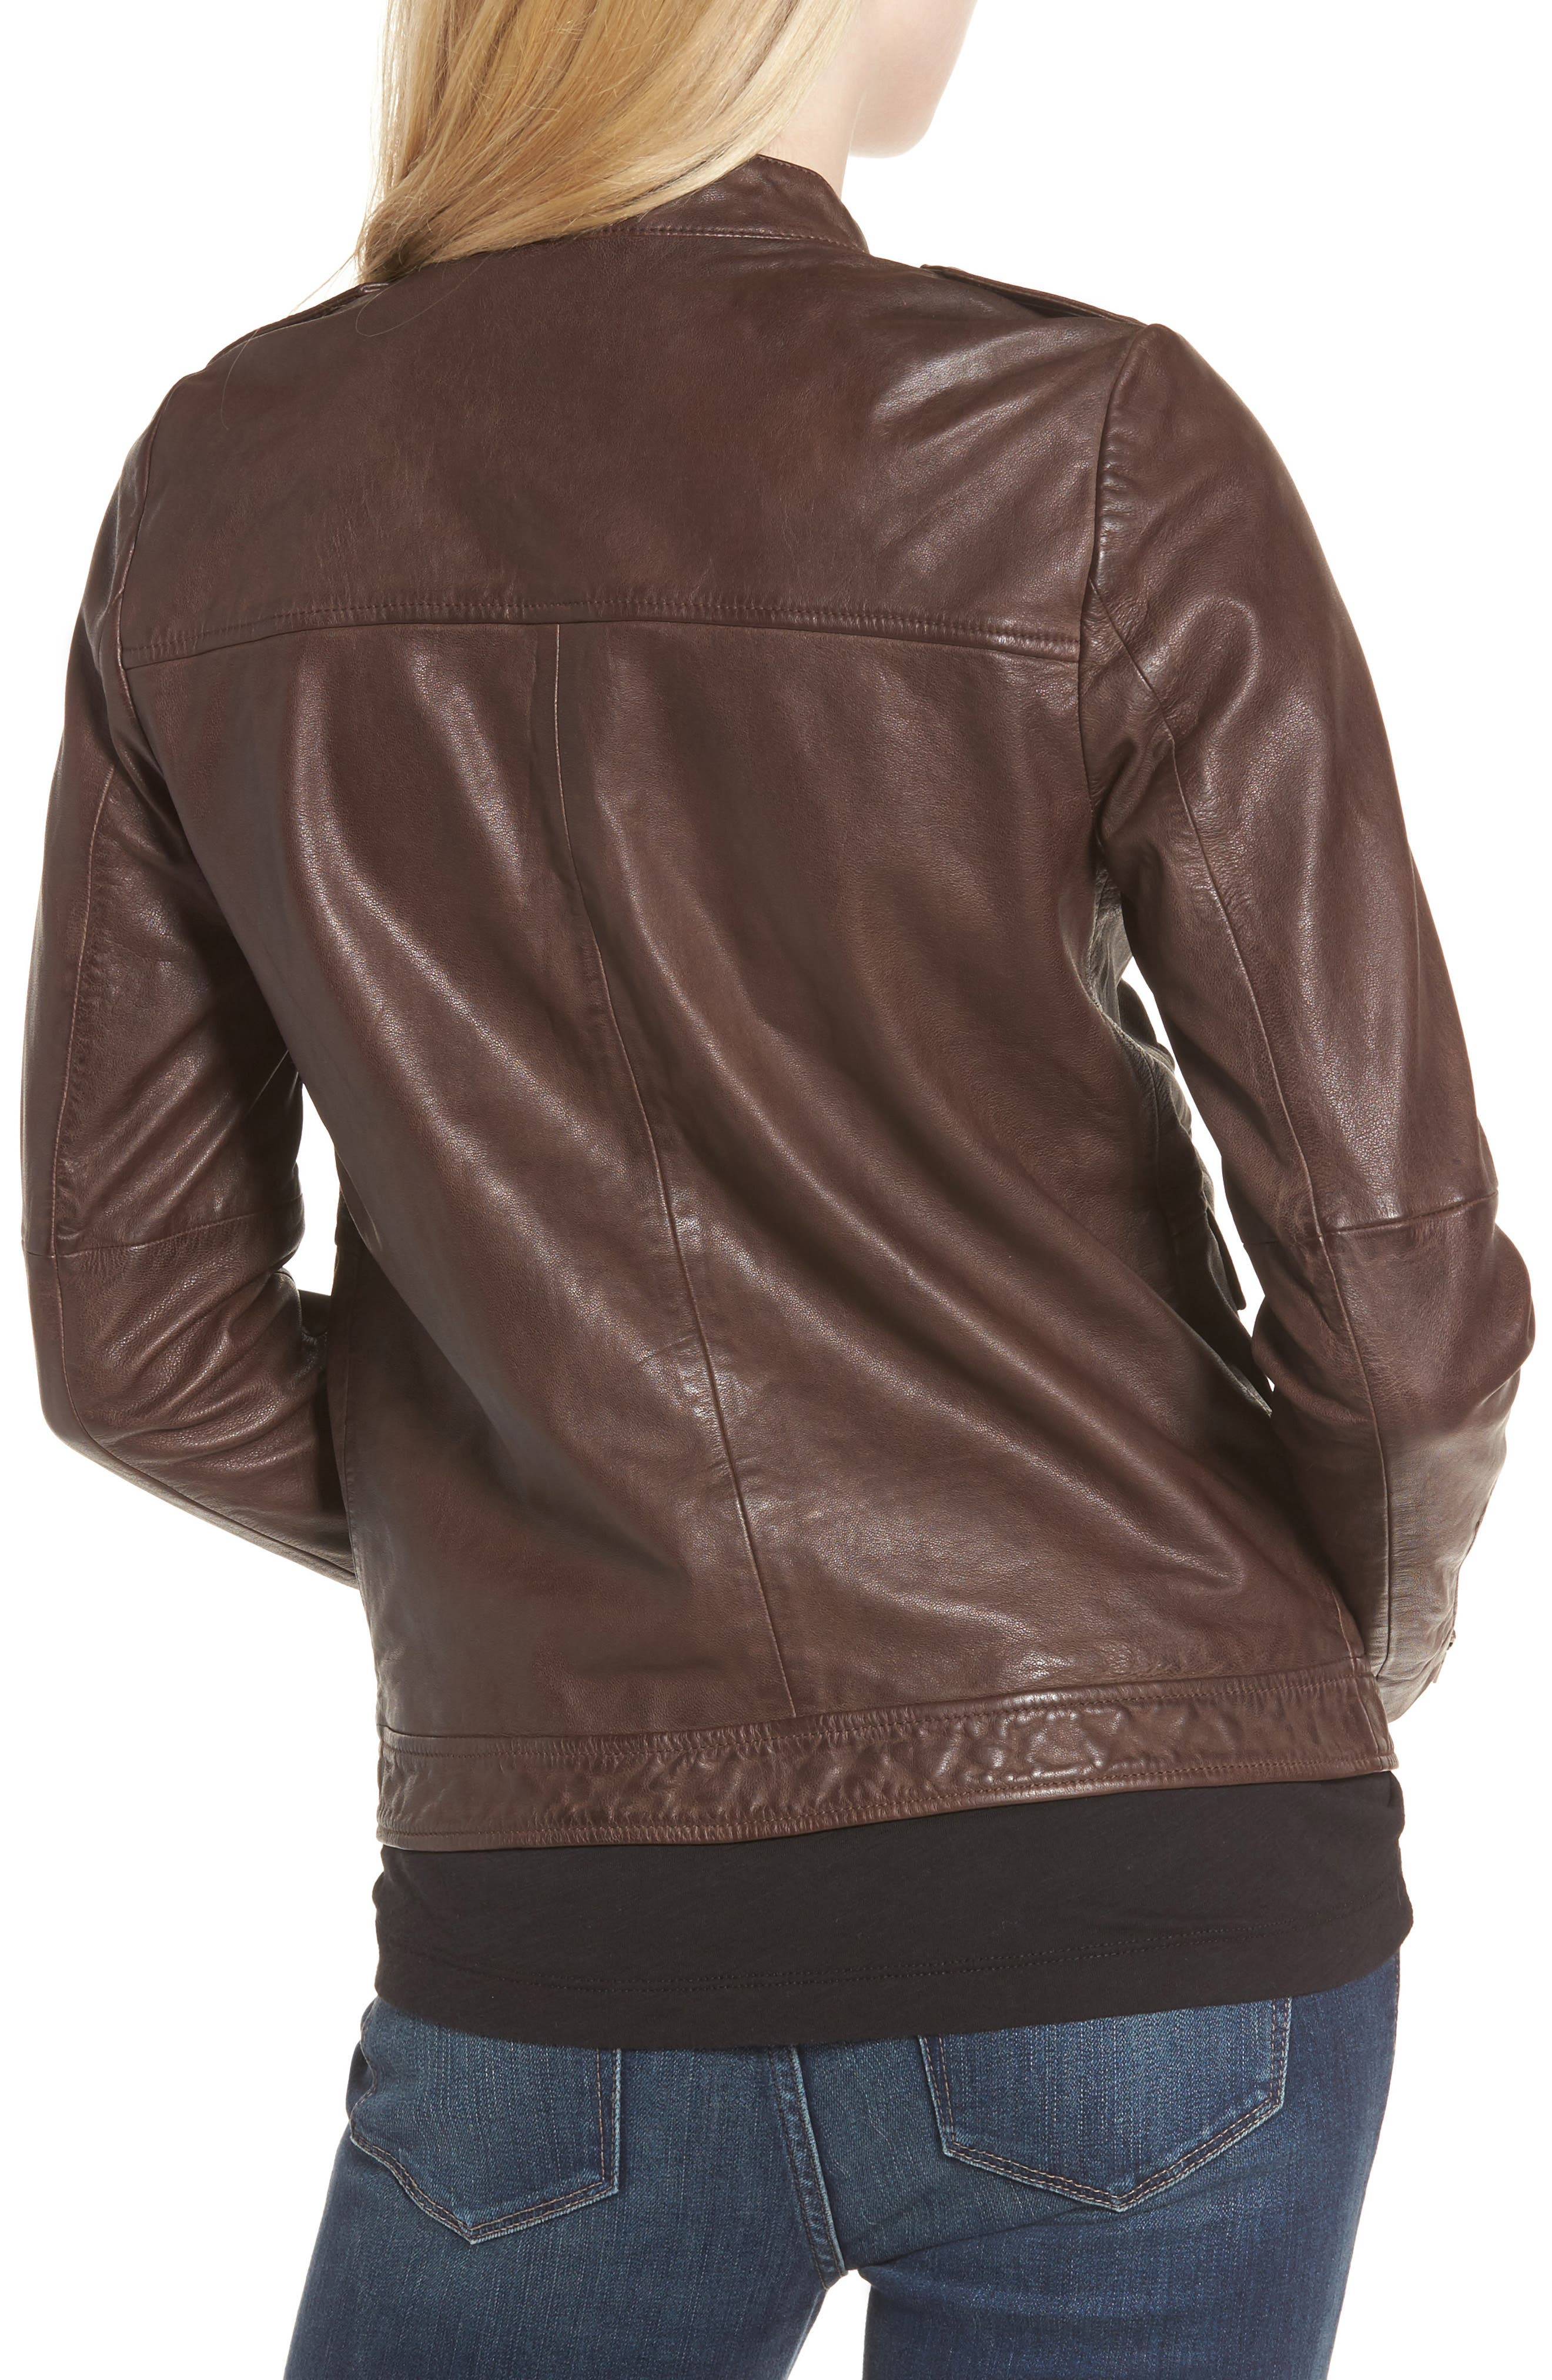 Pocket Detail Leather Jacket,                             Alternate thumbnail 2, color,